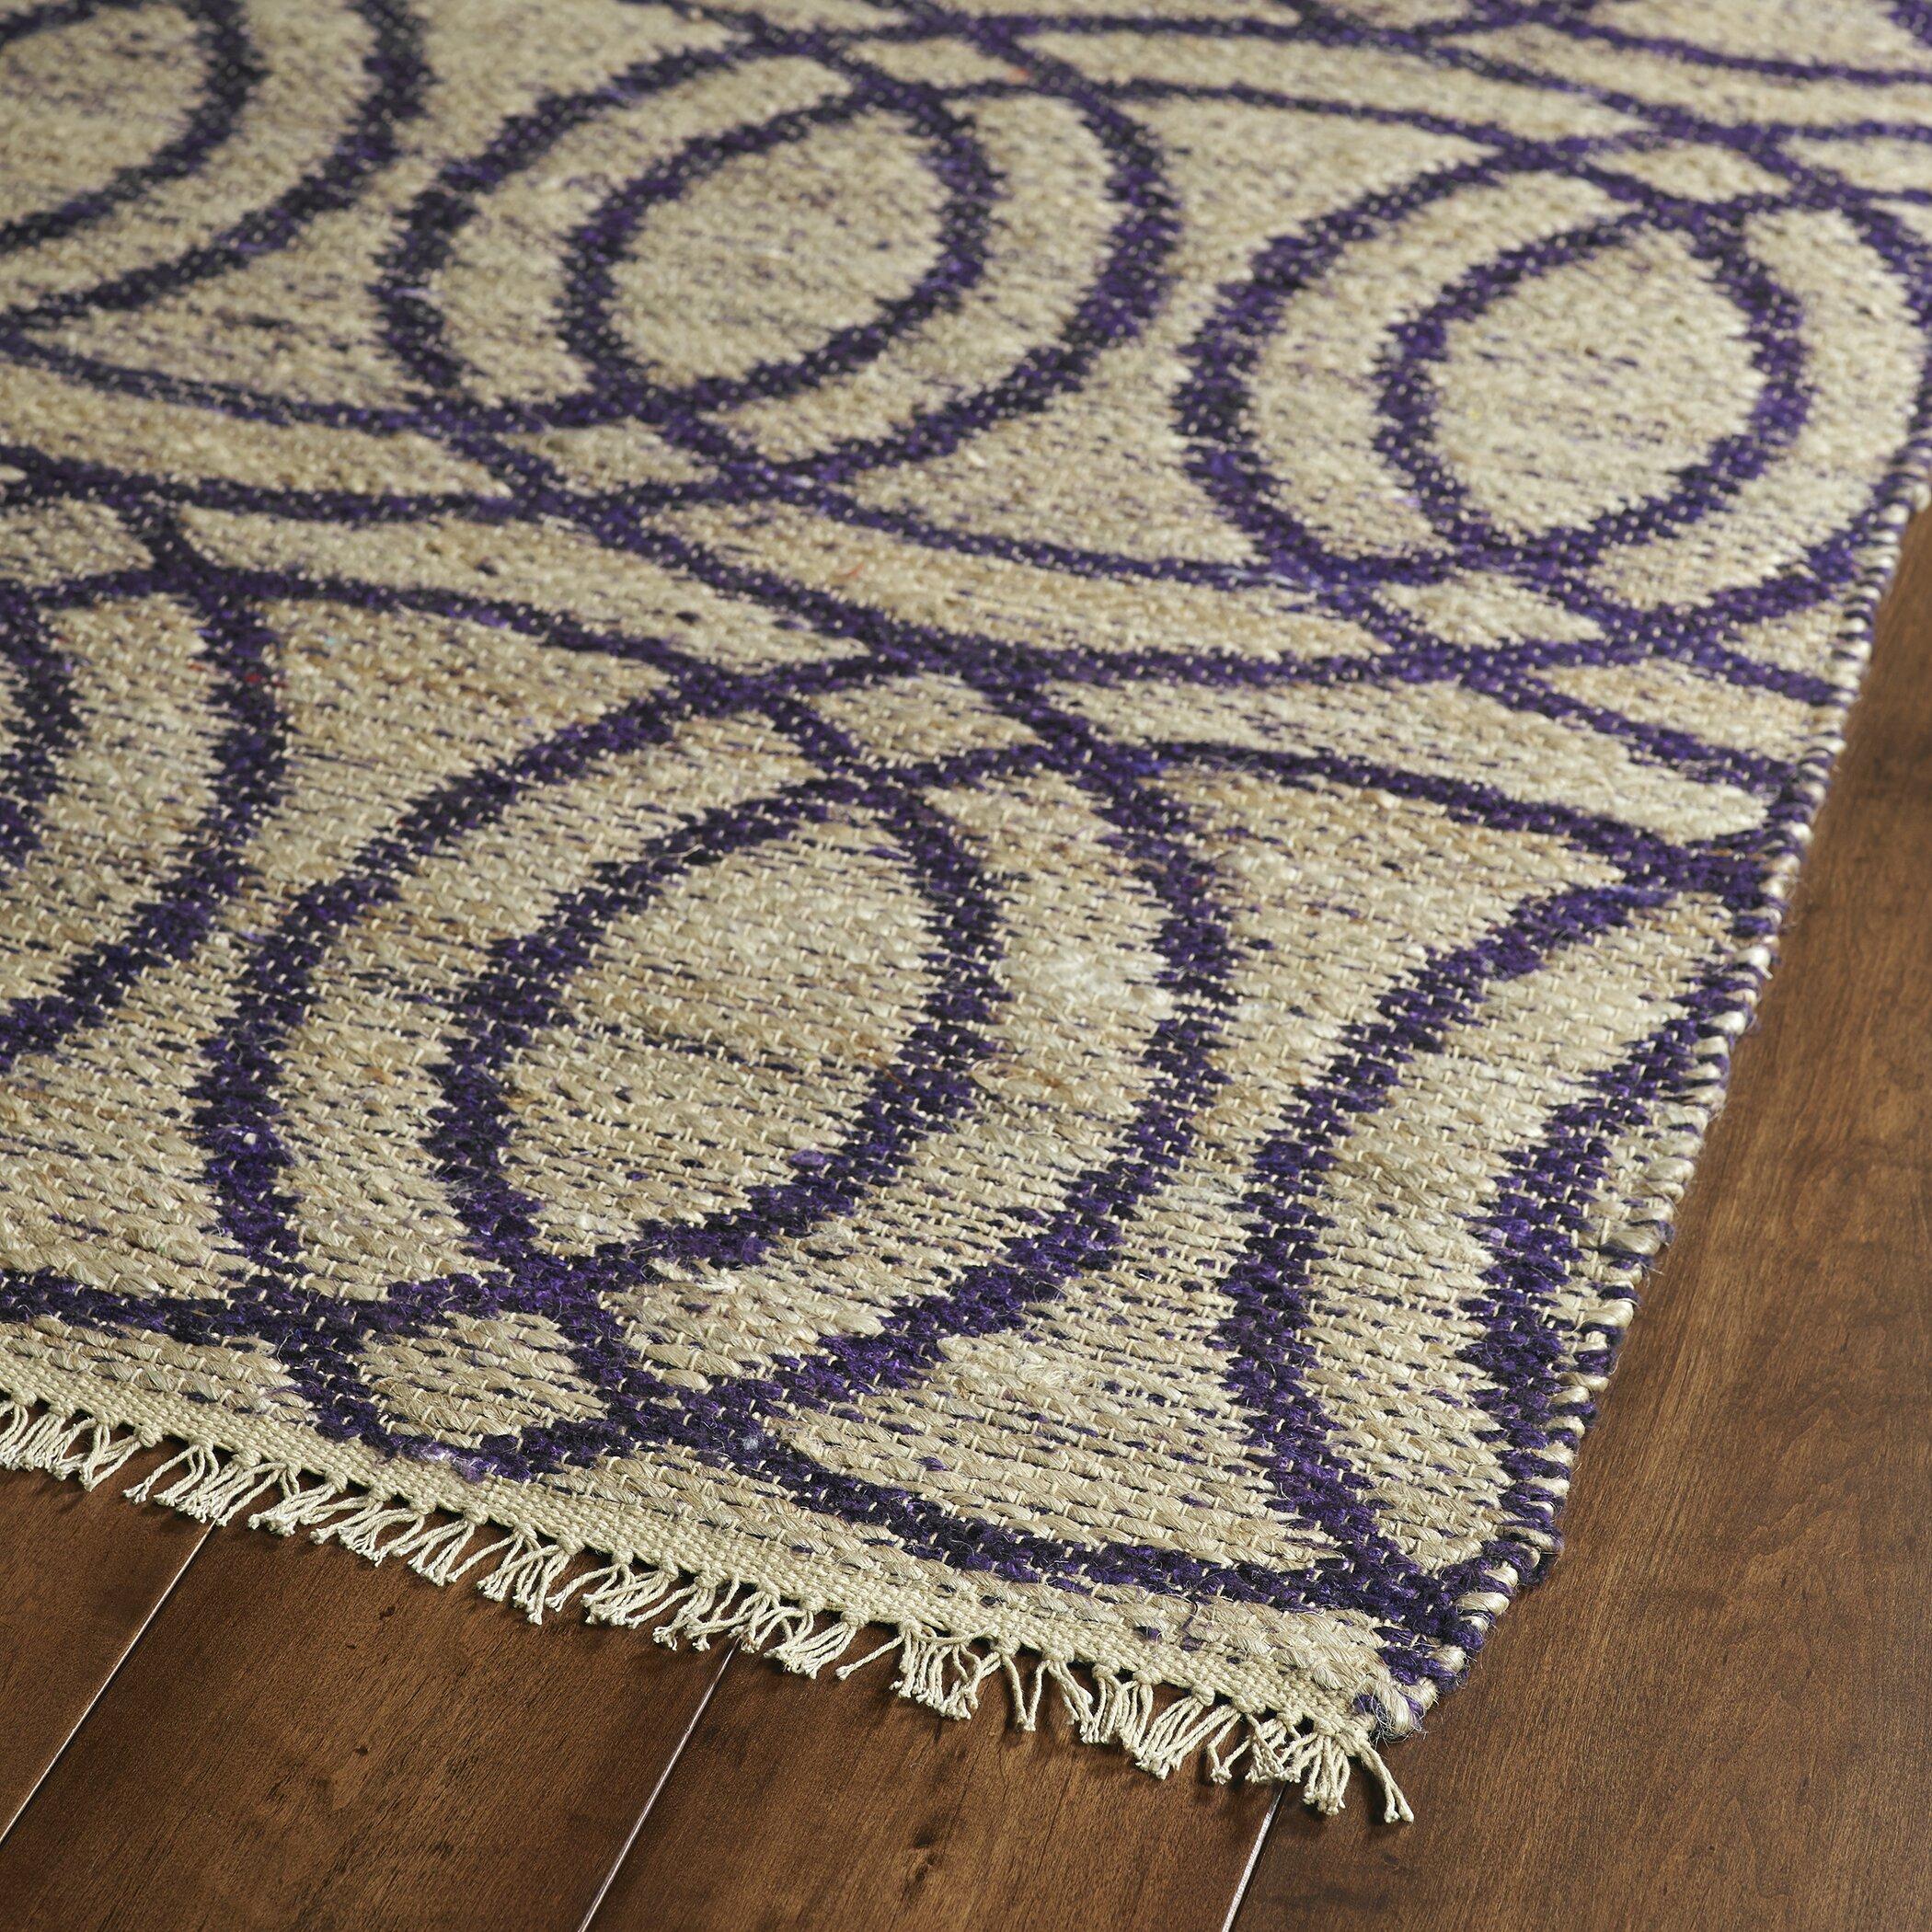 Purple And Gray Area Rugs: Kenwood Grey/Purple Area Rug